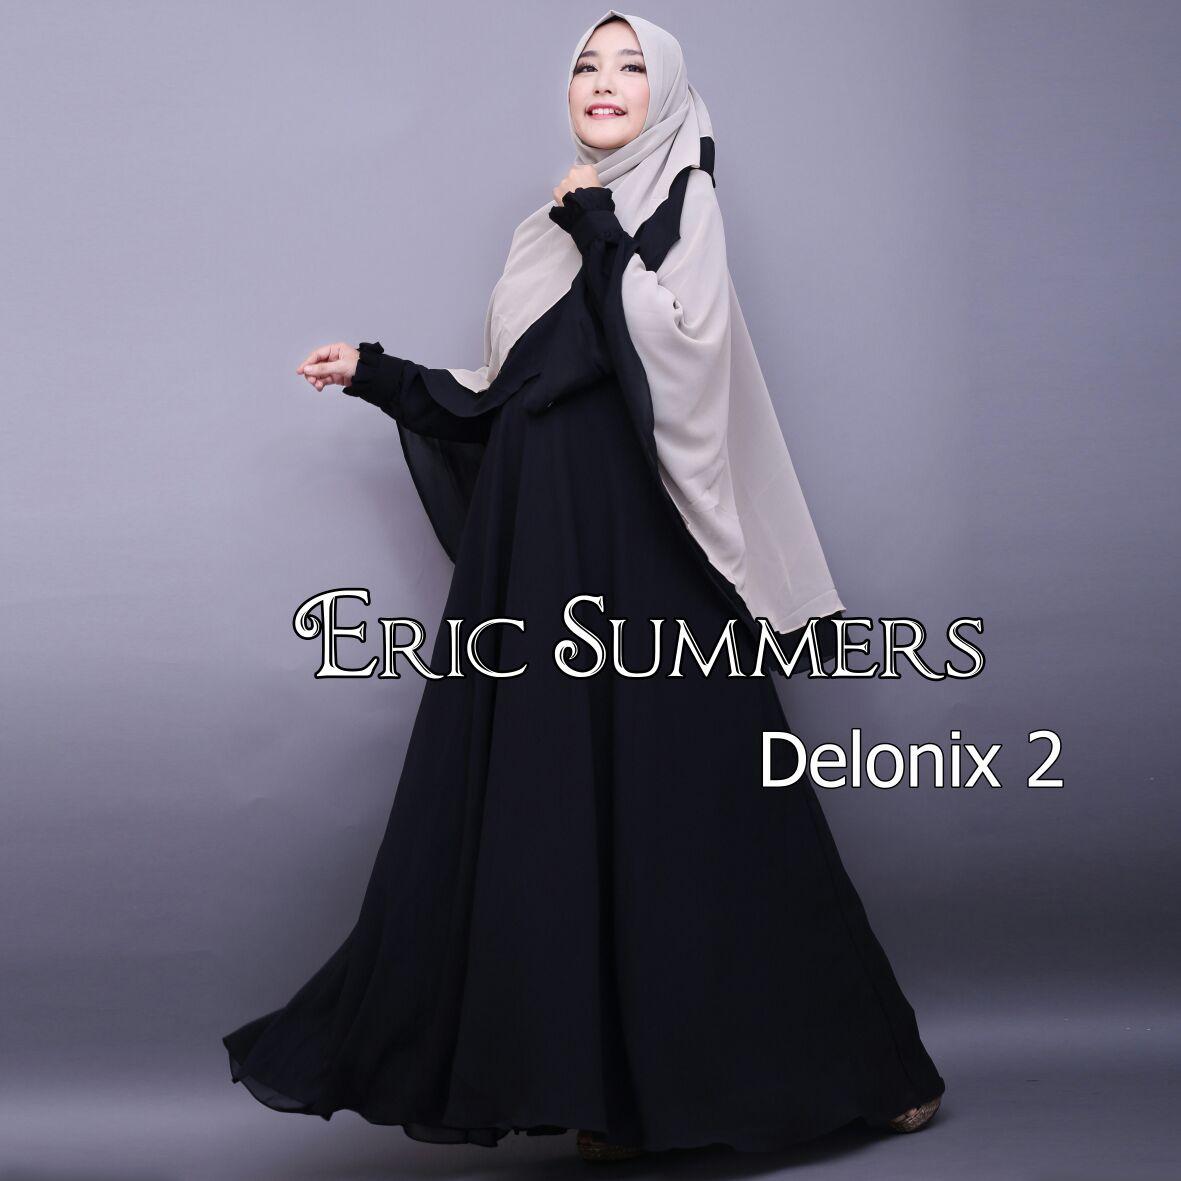 Jual Baju Gamis Hijab Terbaru Delonix Syar Vol 2 By Eric Summers 4261f03cac